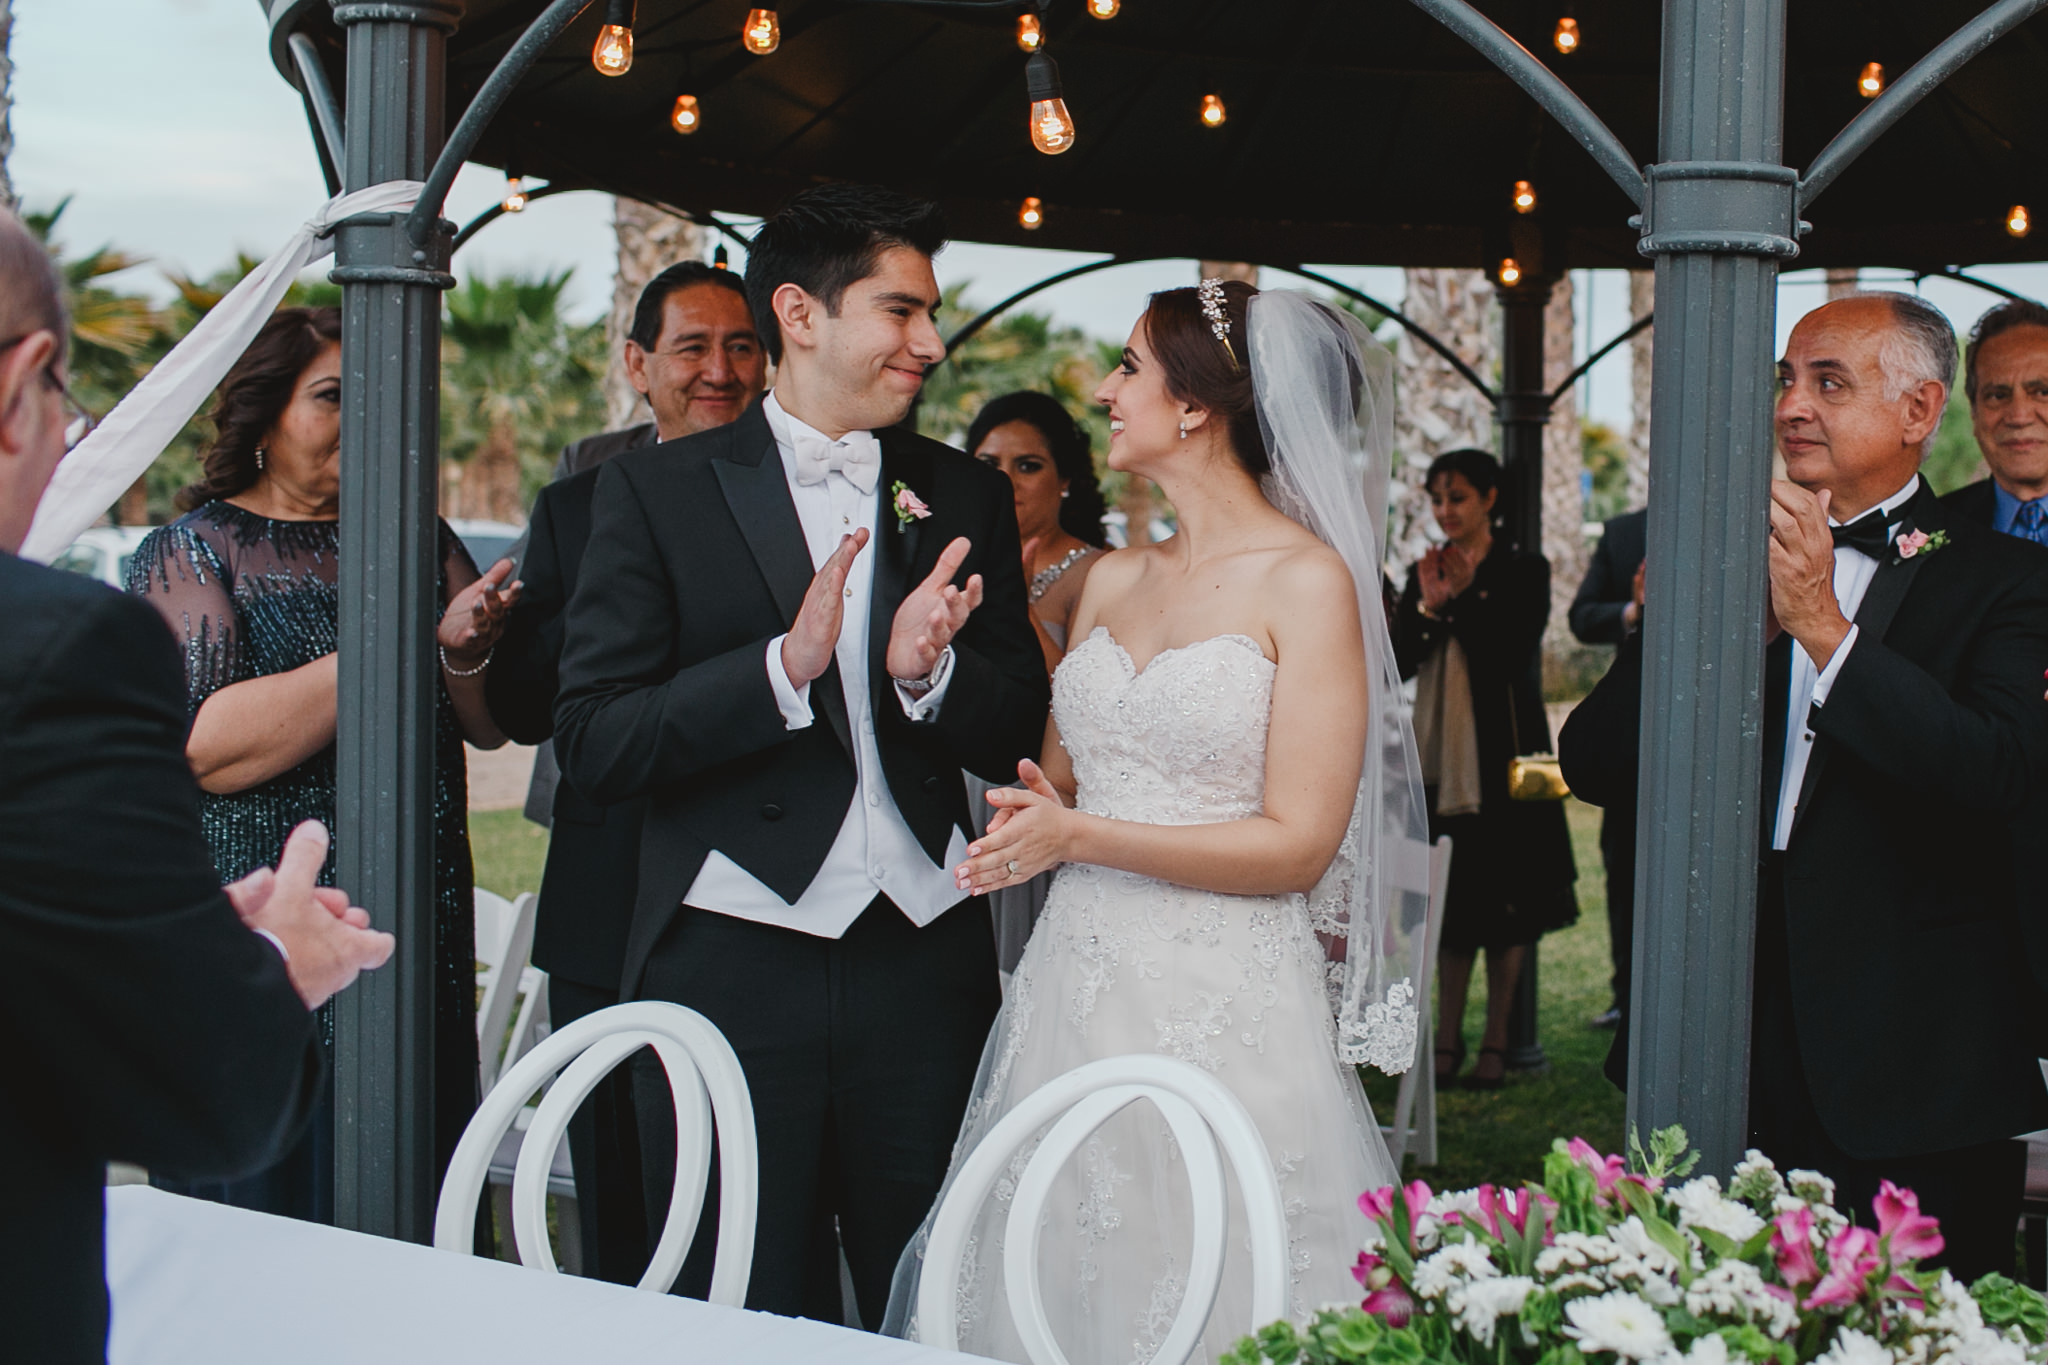 boda-en-torreon-armando-aragon-21